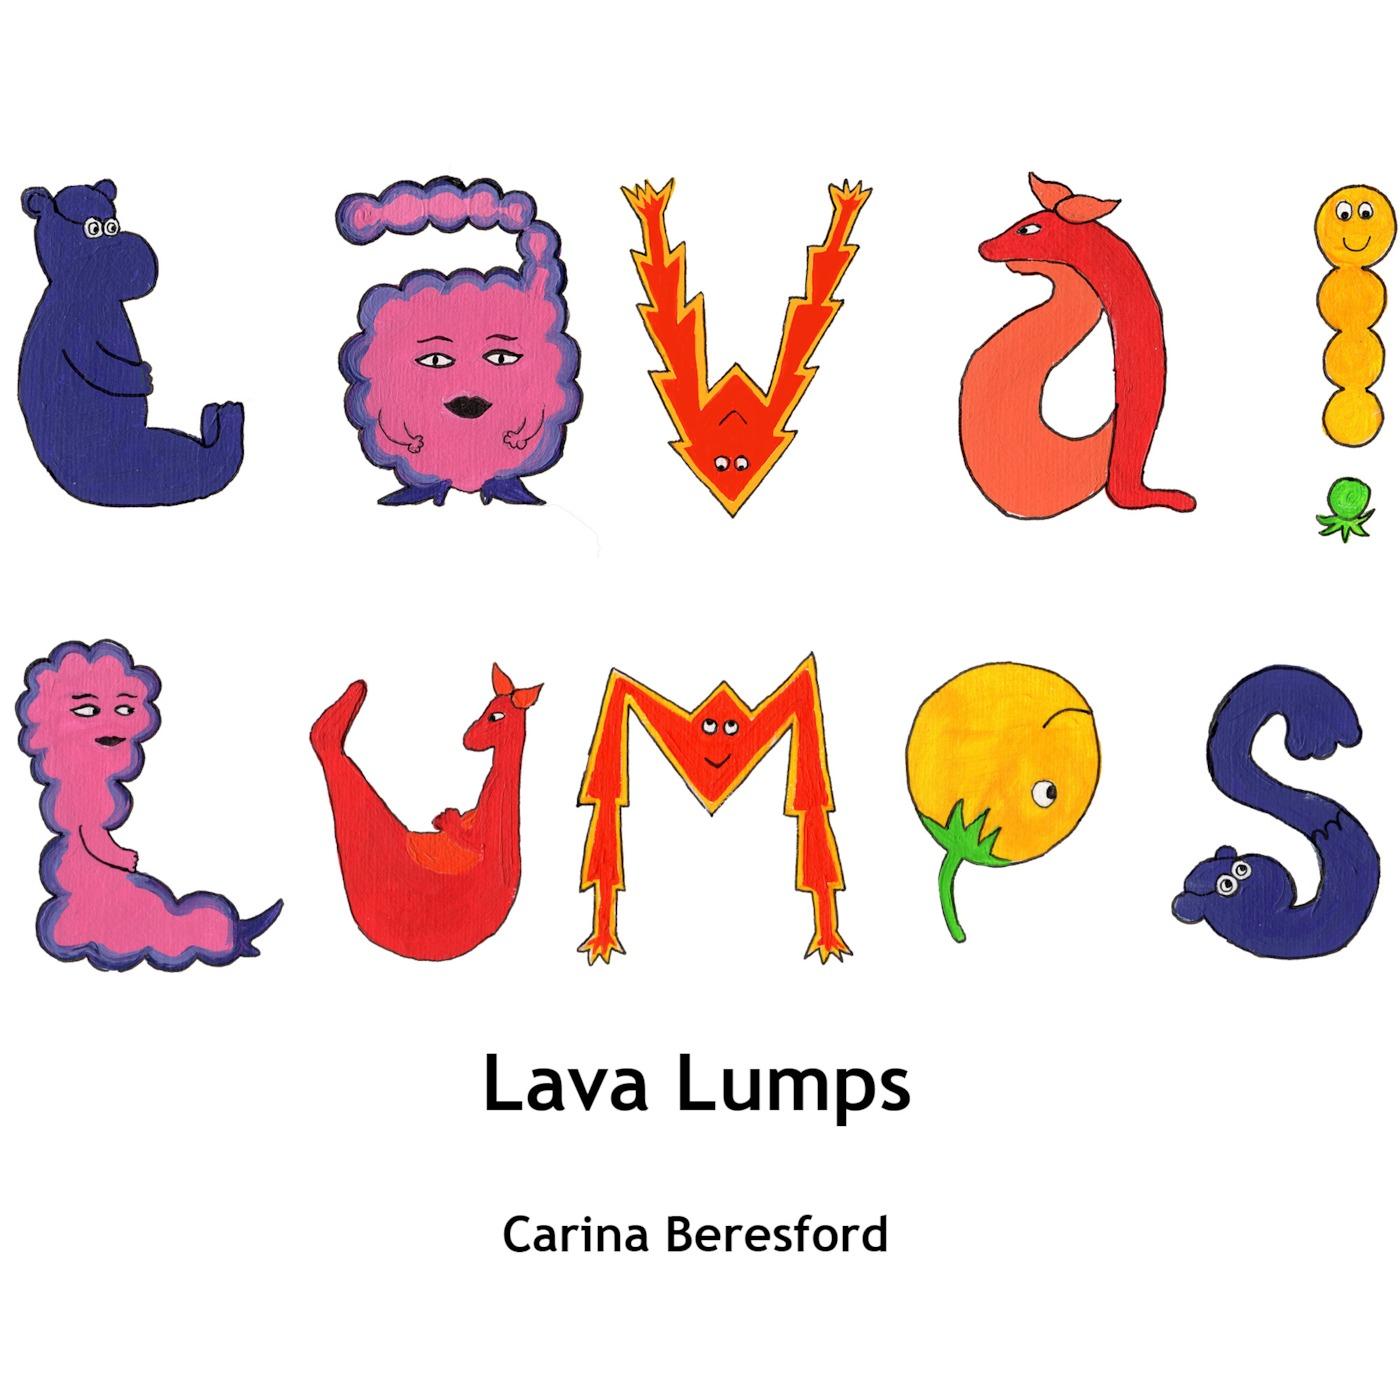 Lava Lumps